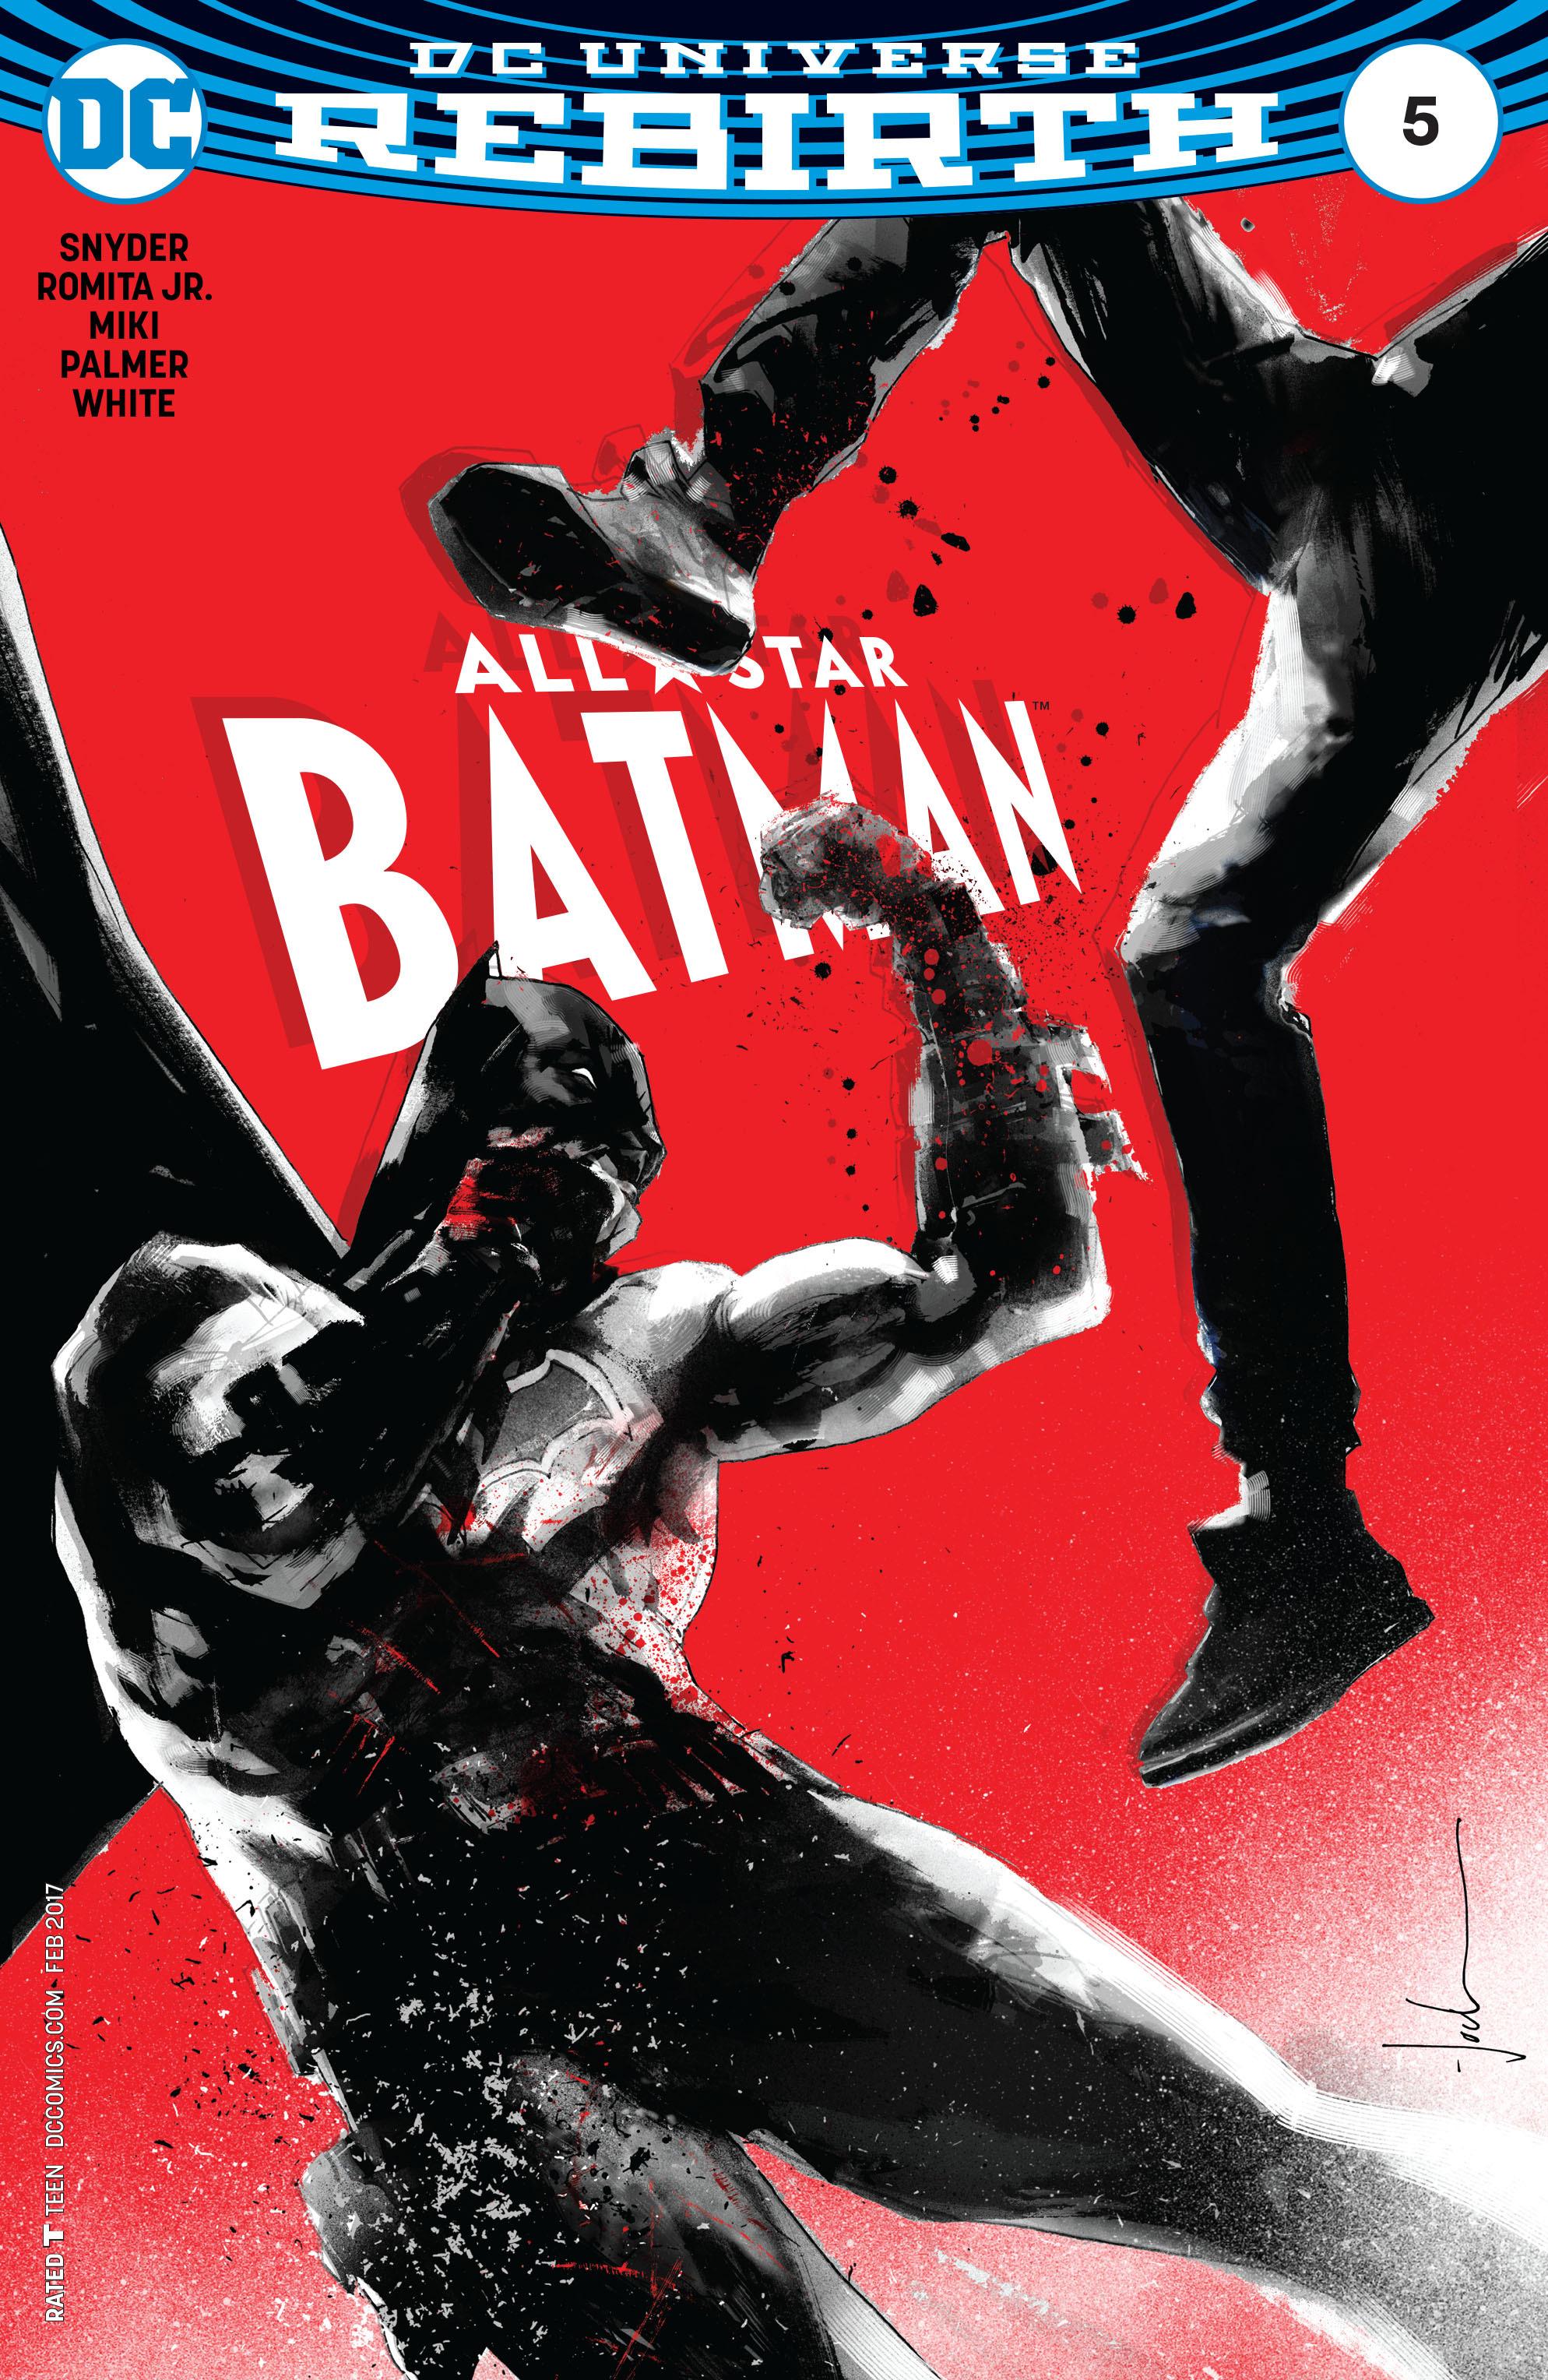 Read online All-Star Batman comic -  Issue #5 - 4